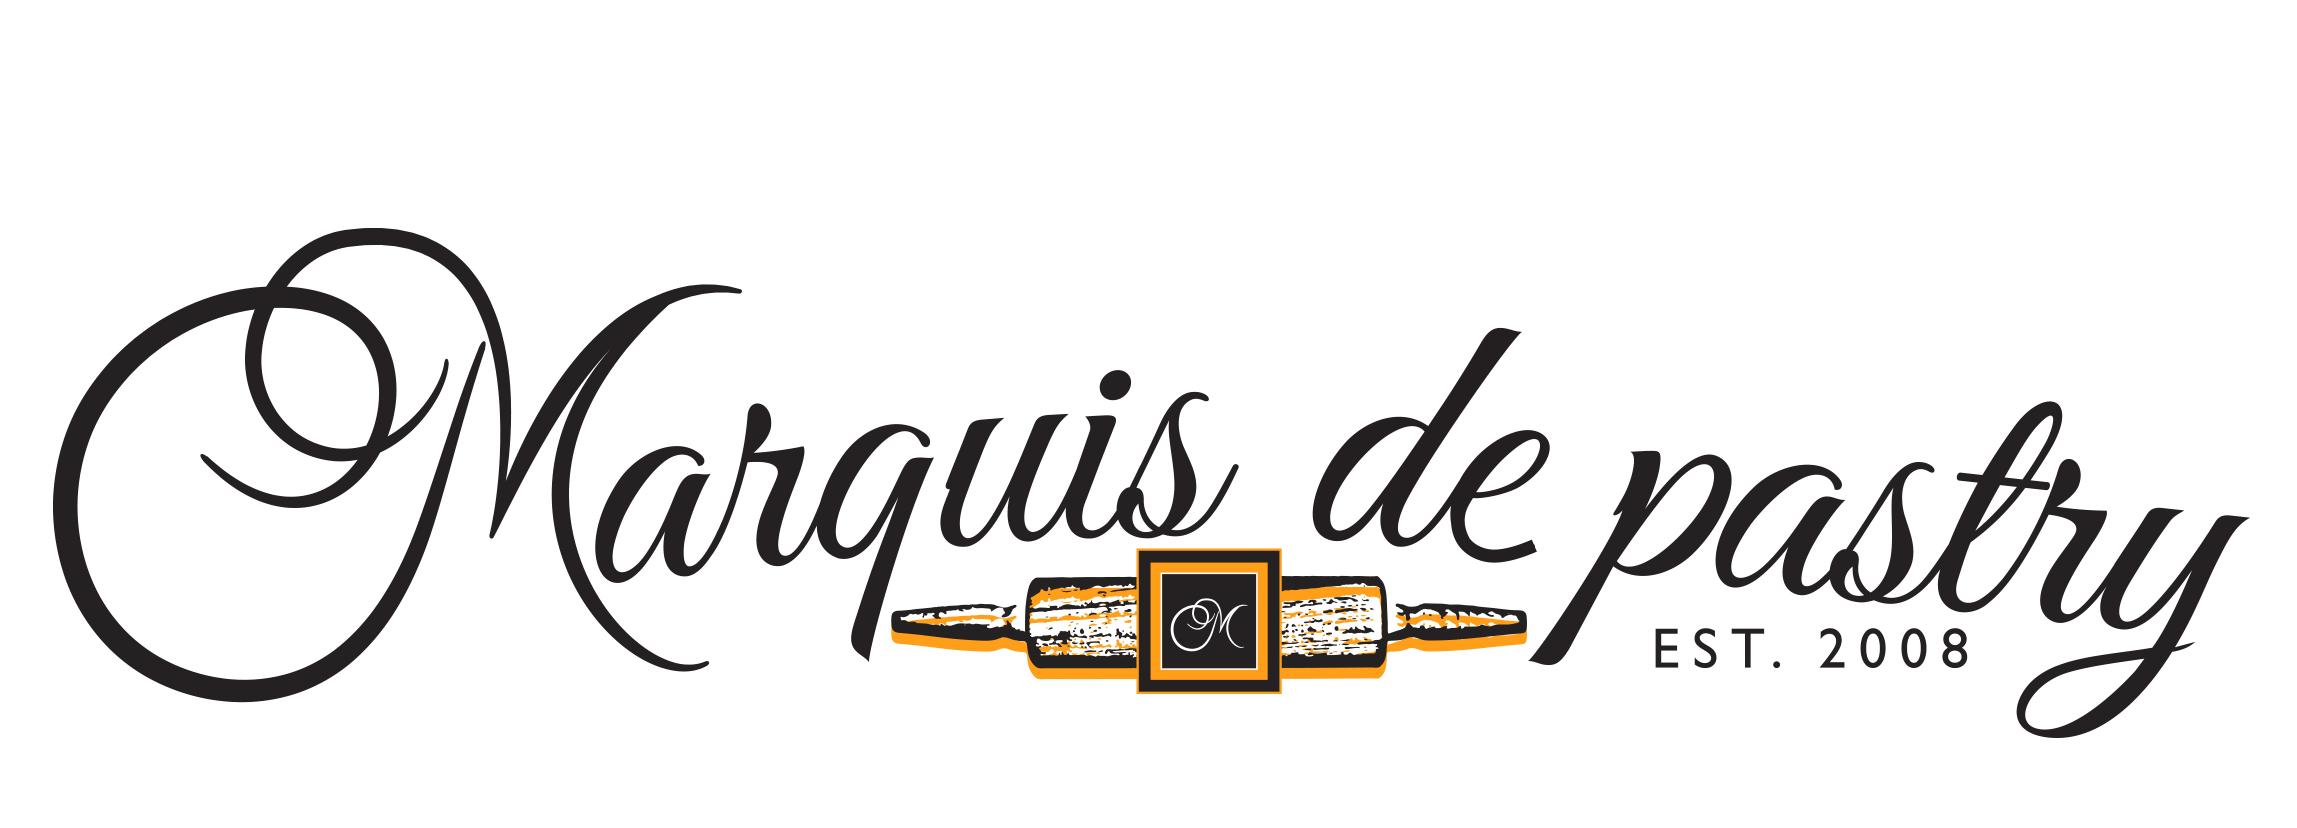 Marquis de pastry